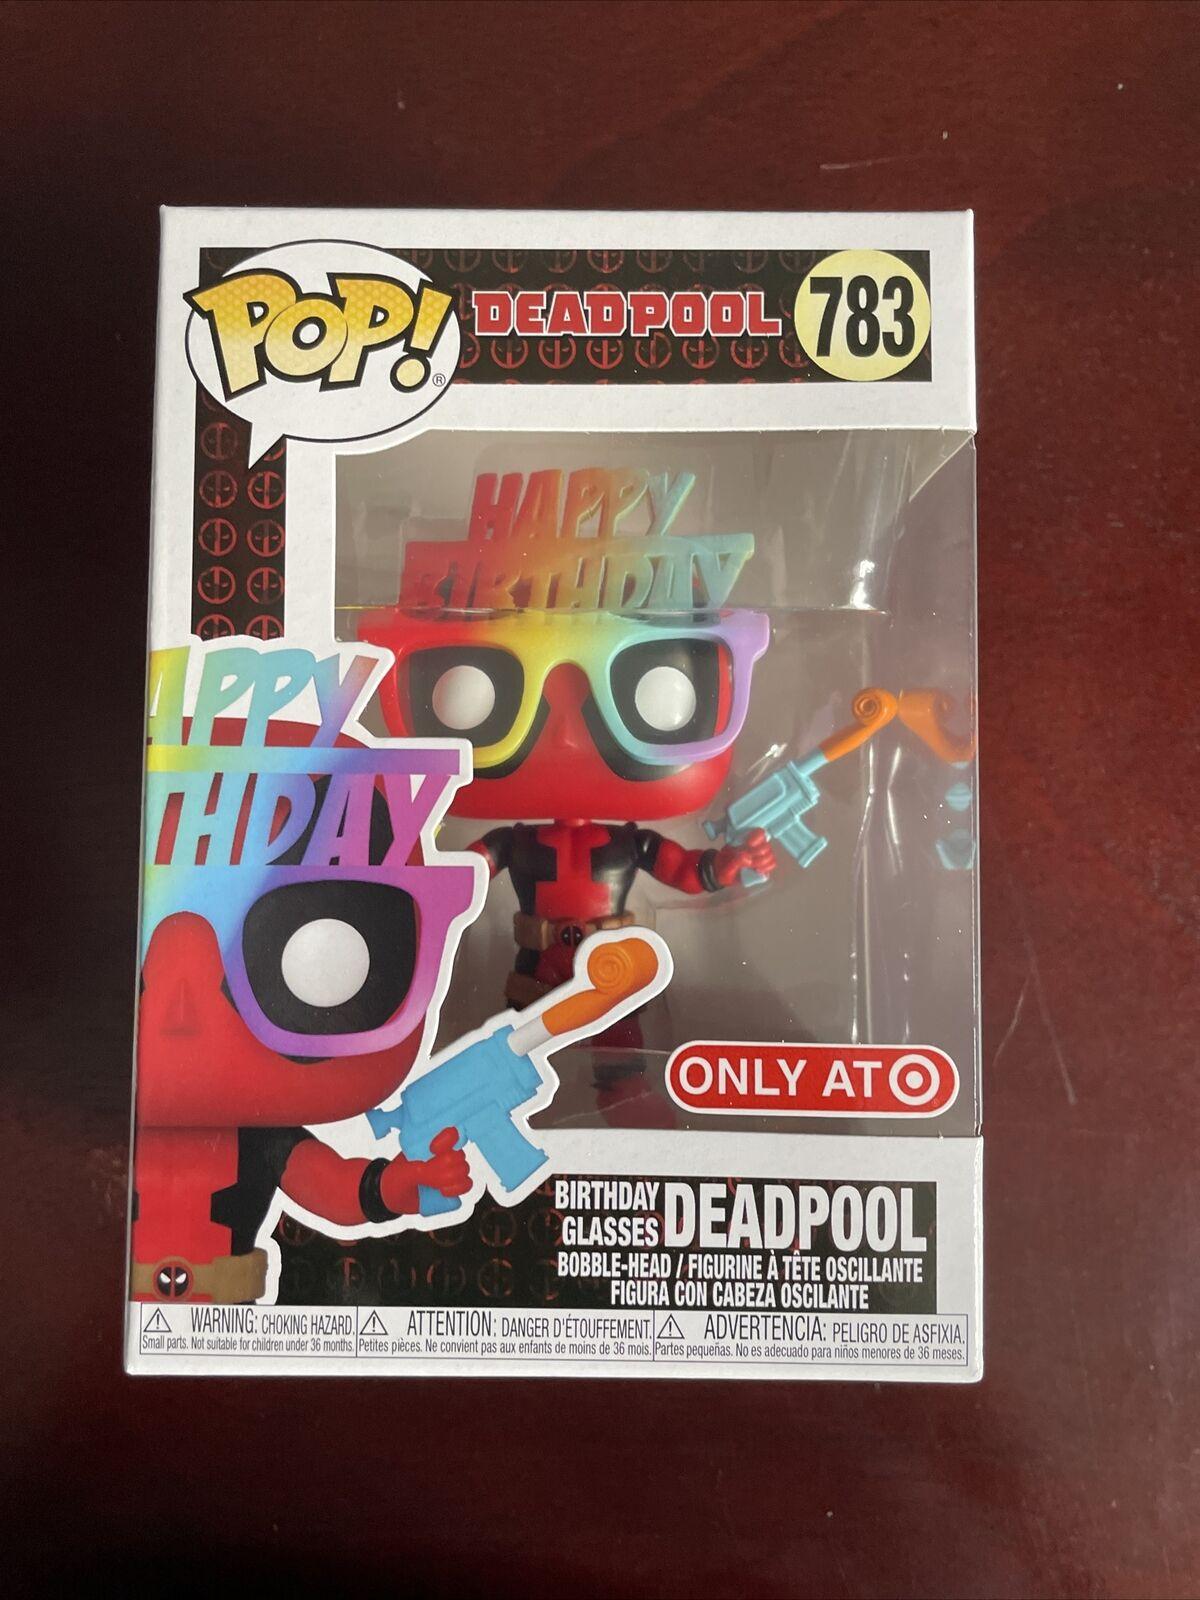 Funko Pop Birthday Classes Deadpool Bobble Head 783 For Sale Online Ebay